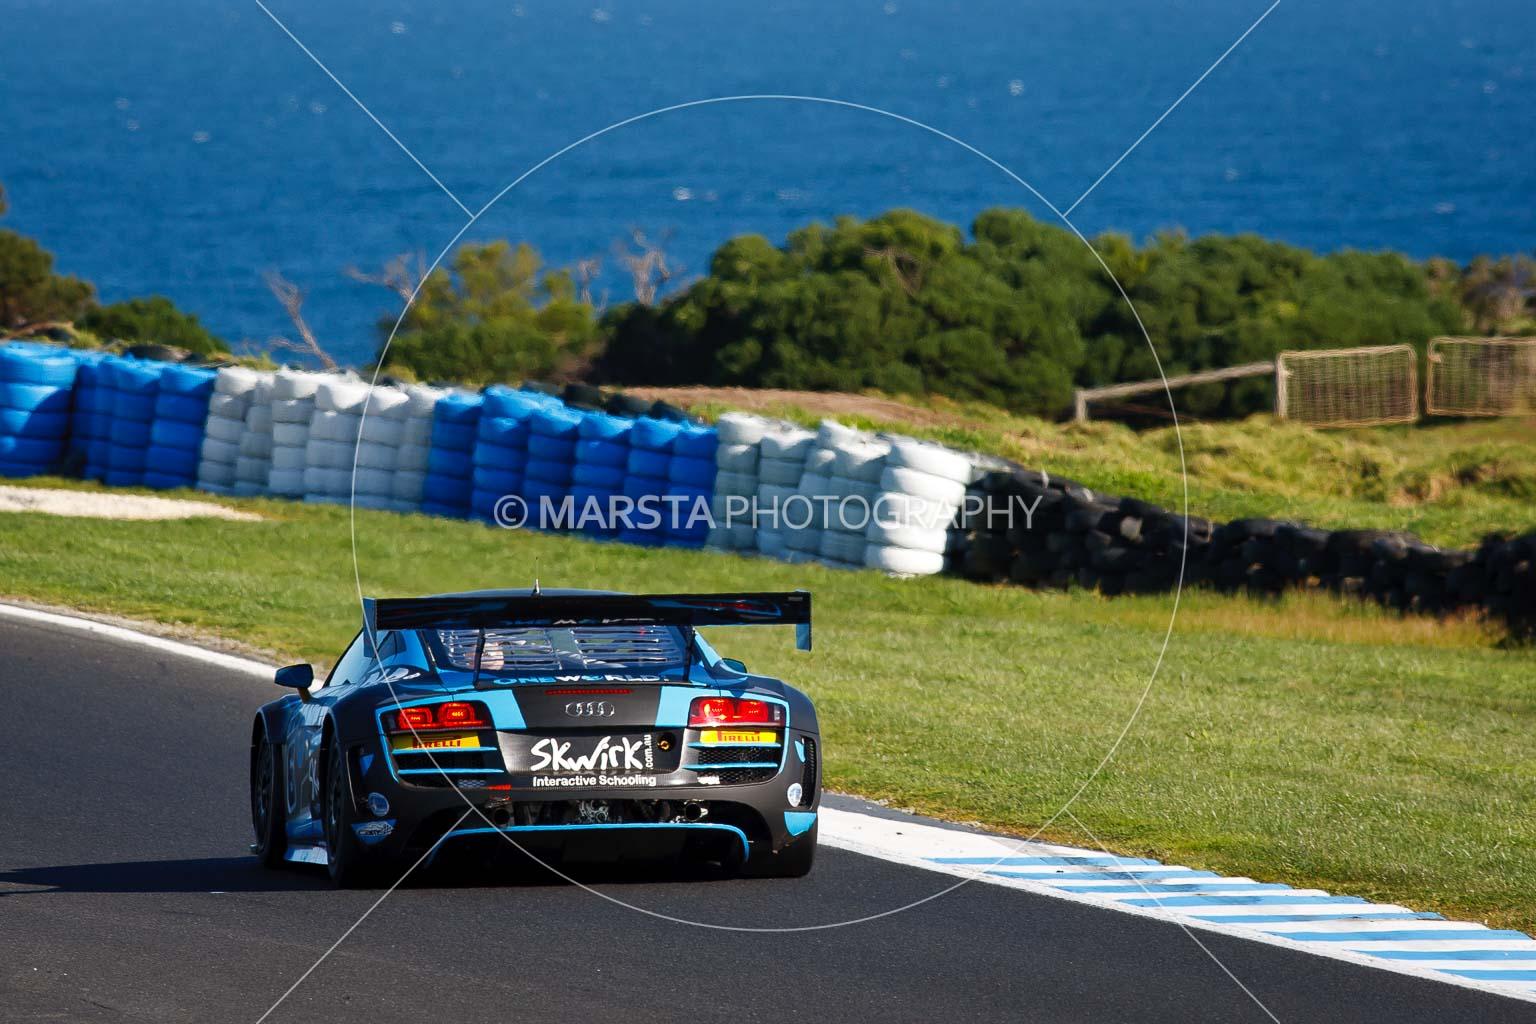 (6);23 September 2012;6;AGT;Audi R8 LMS;Australia;Australian GT Championship;Grand Tourer;Phillip Island;Rod Salmon;Shannons Nationals;VIC;Victoria;auto;endurance;motorsport;ocean;racing;super telephoto